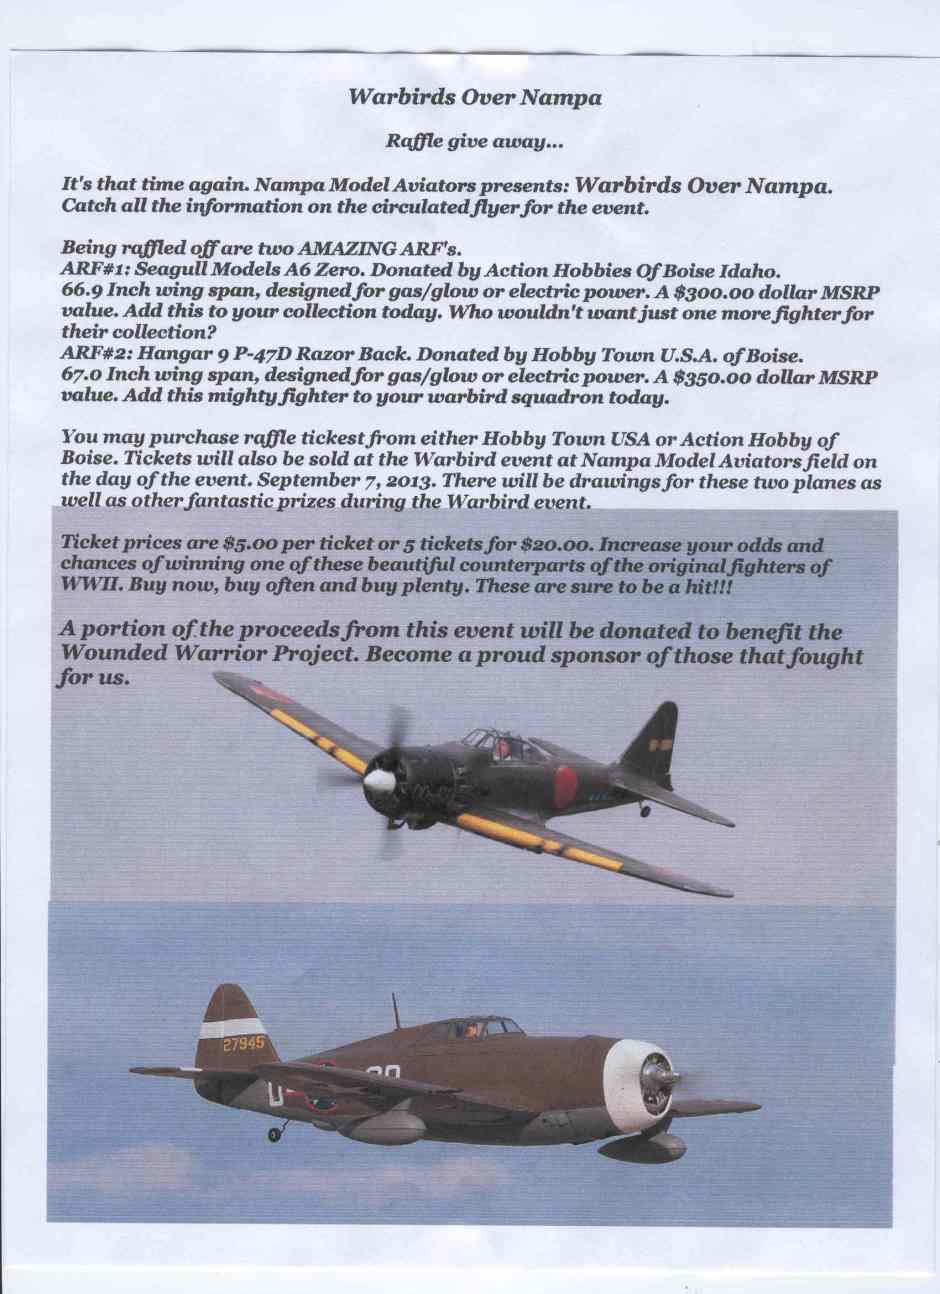 Warbirds over Nampa 2013 Raffle Image